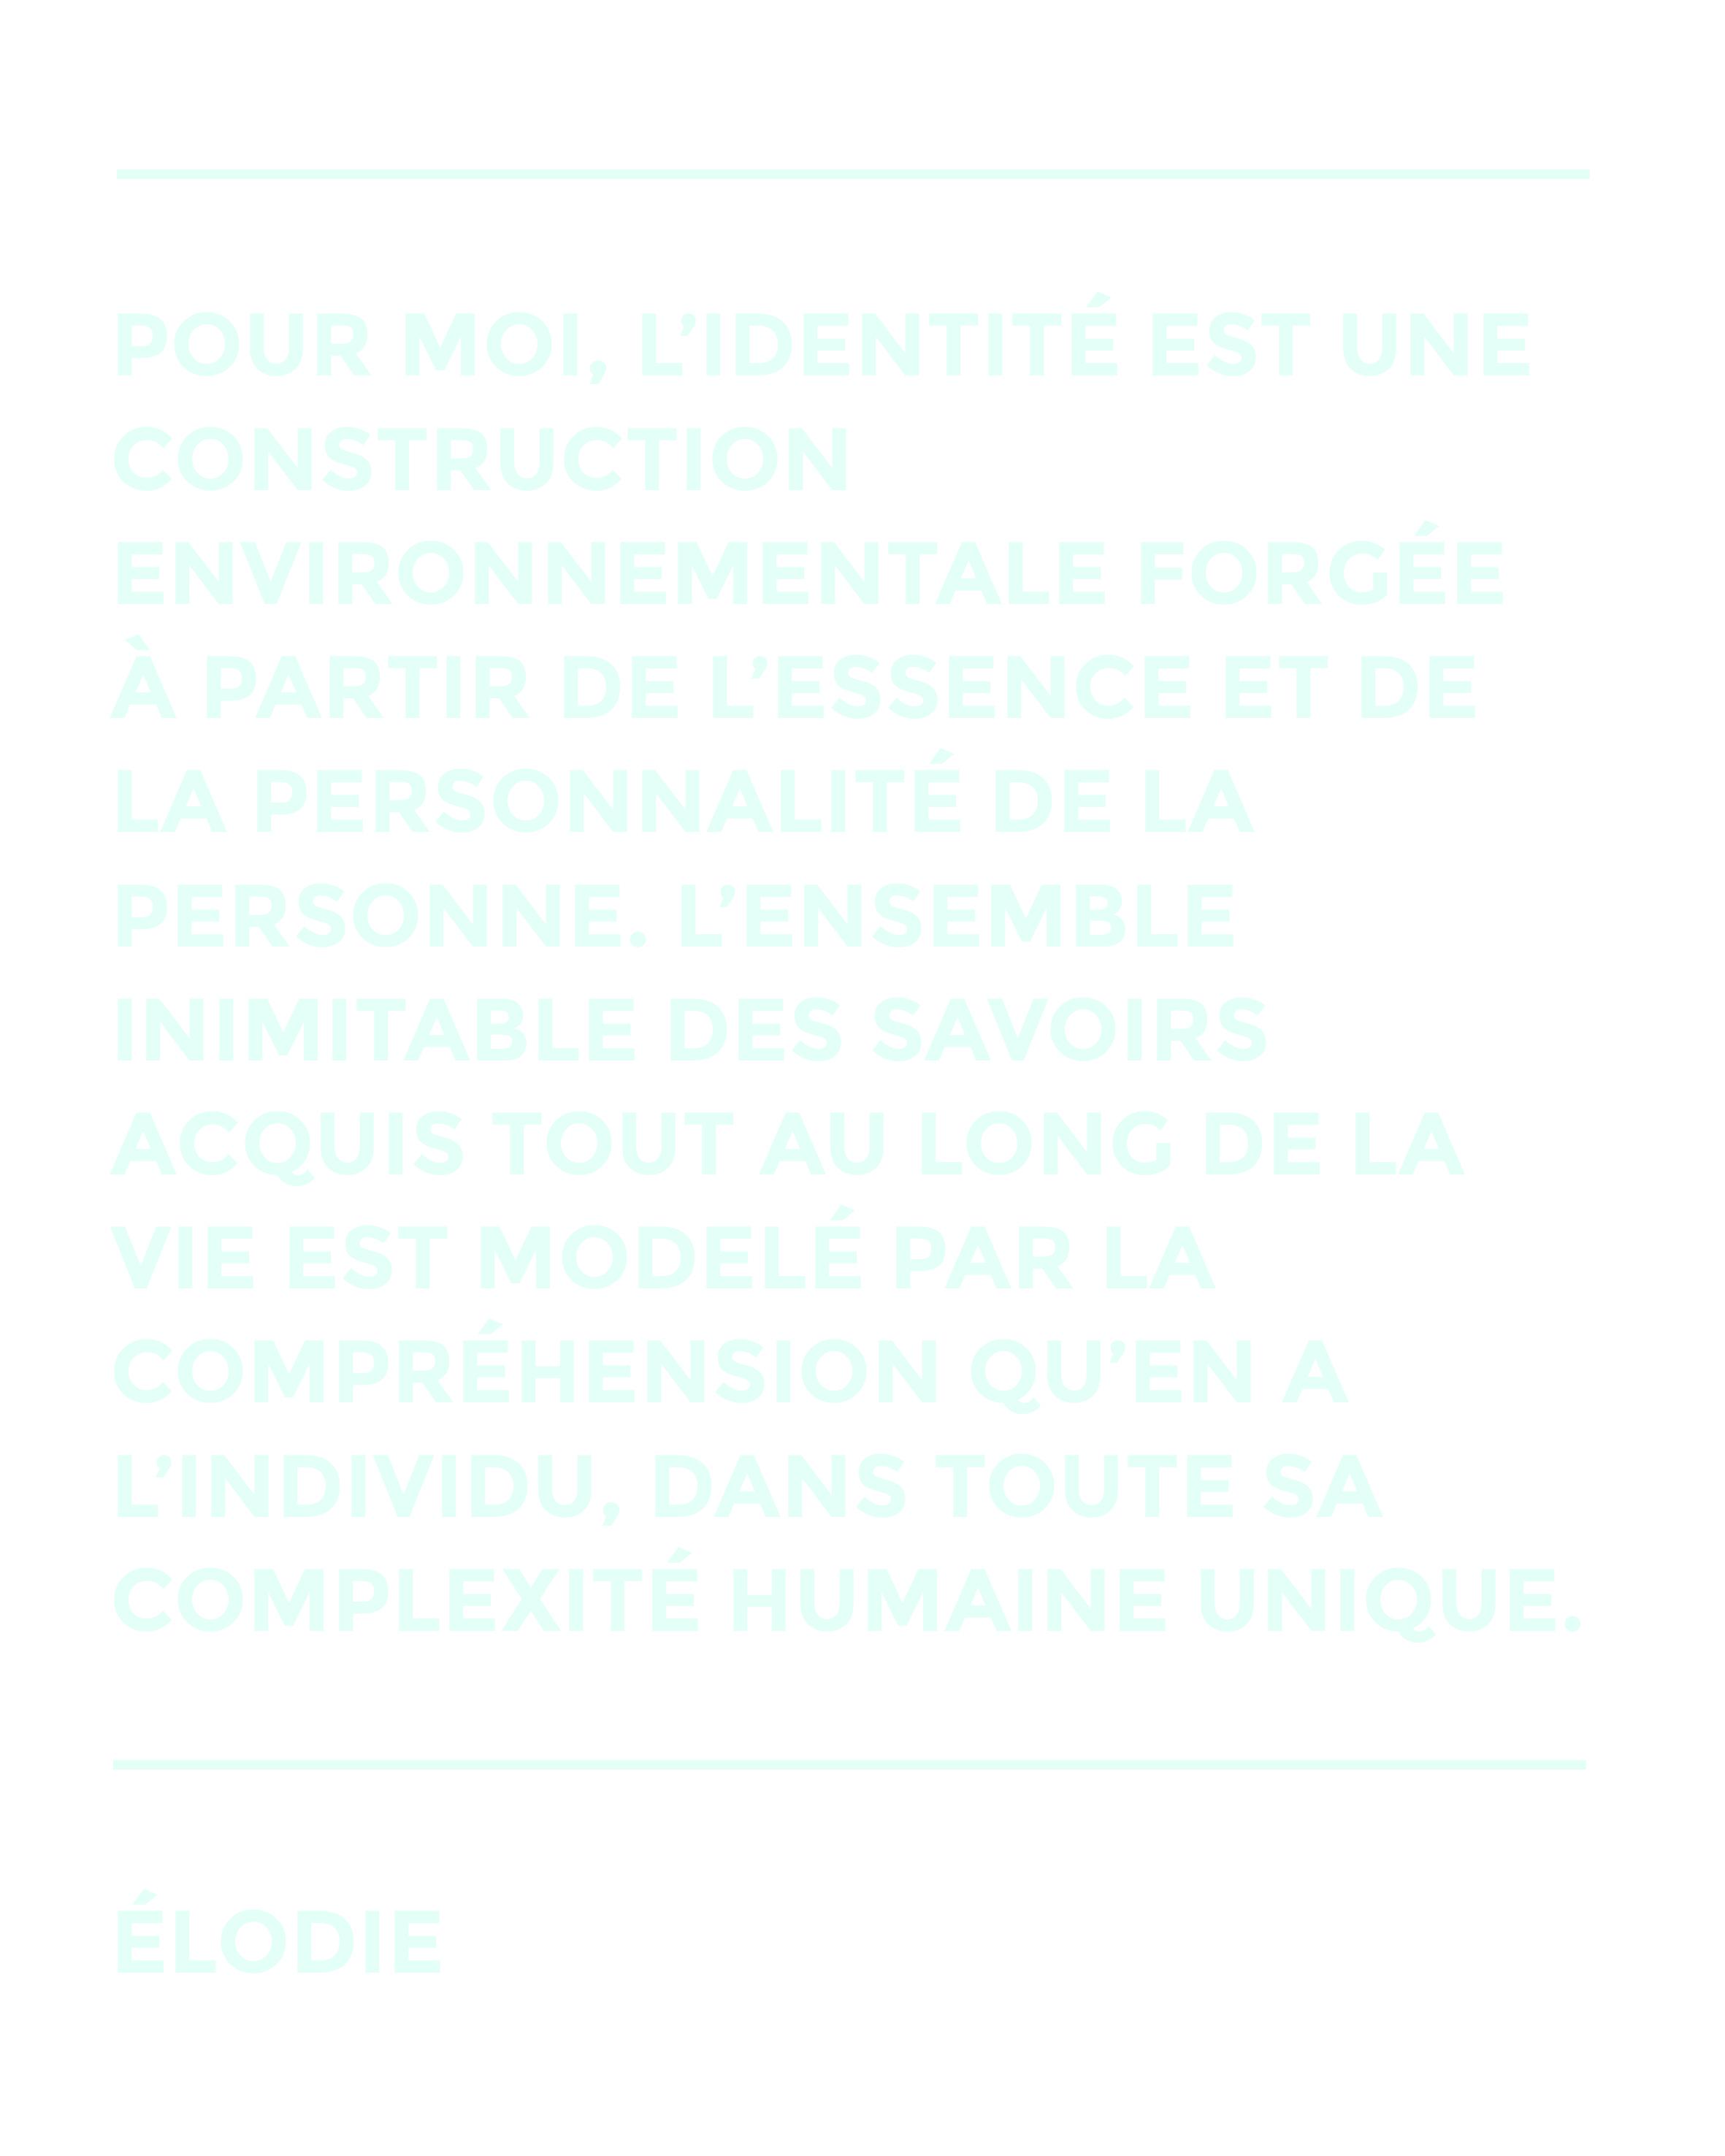 Élodie-Définition.jpg